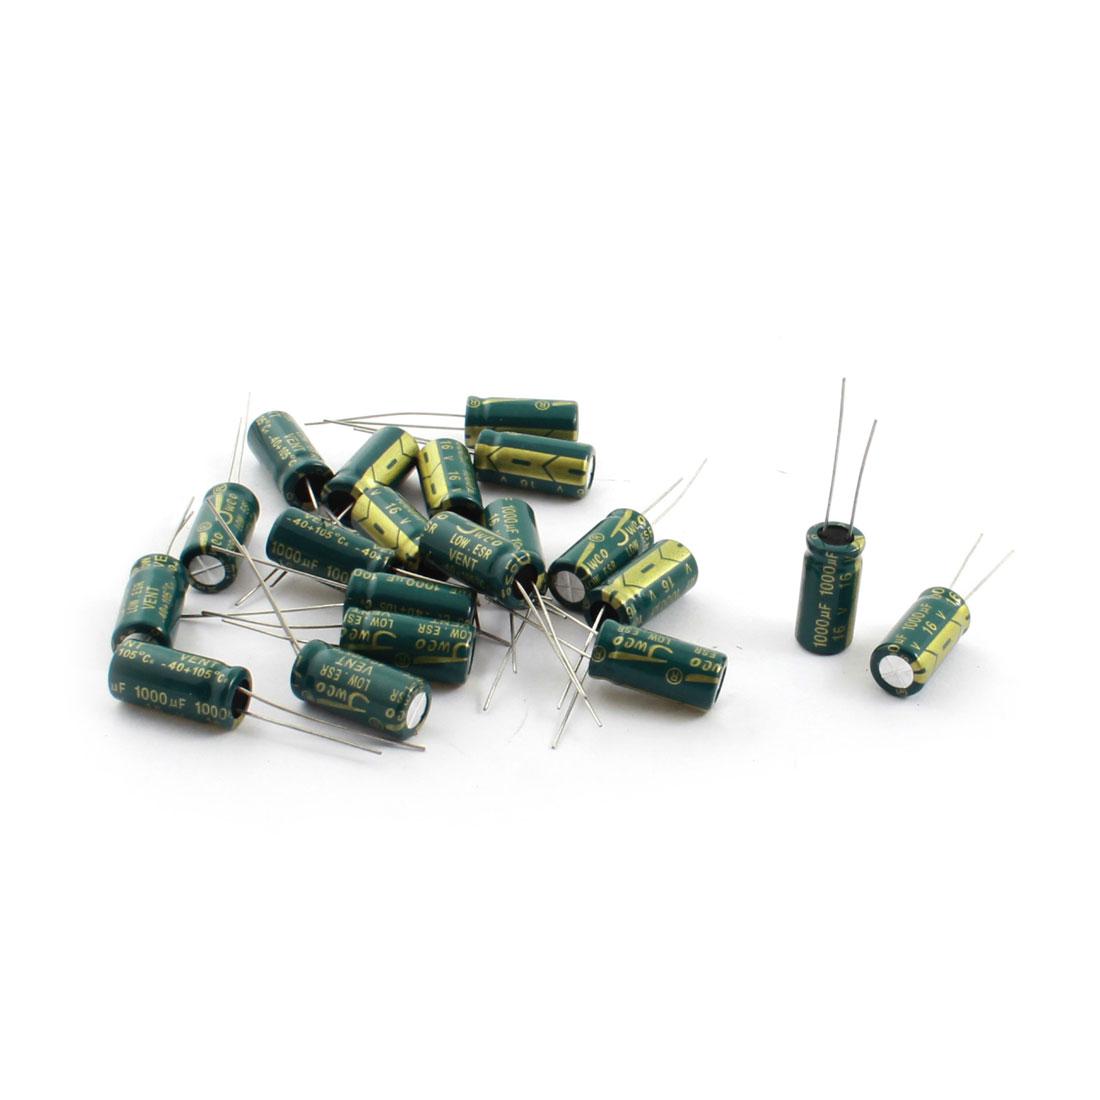 20pcs Radial Lead Electronic Elements Electrolytic Capacitors 1000uF 16V 105C